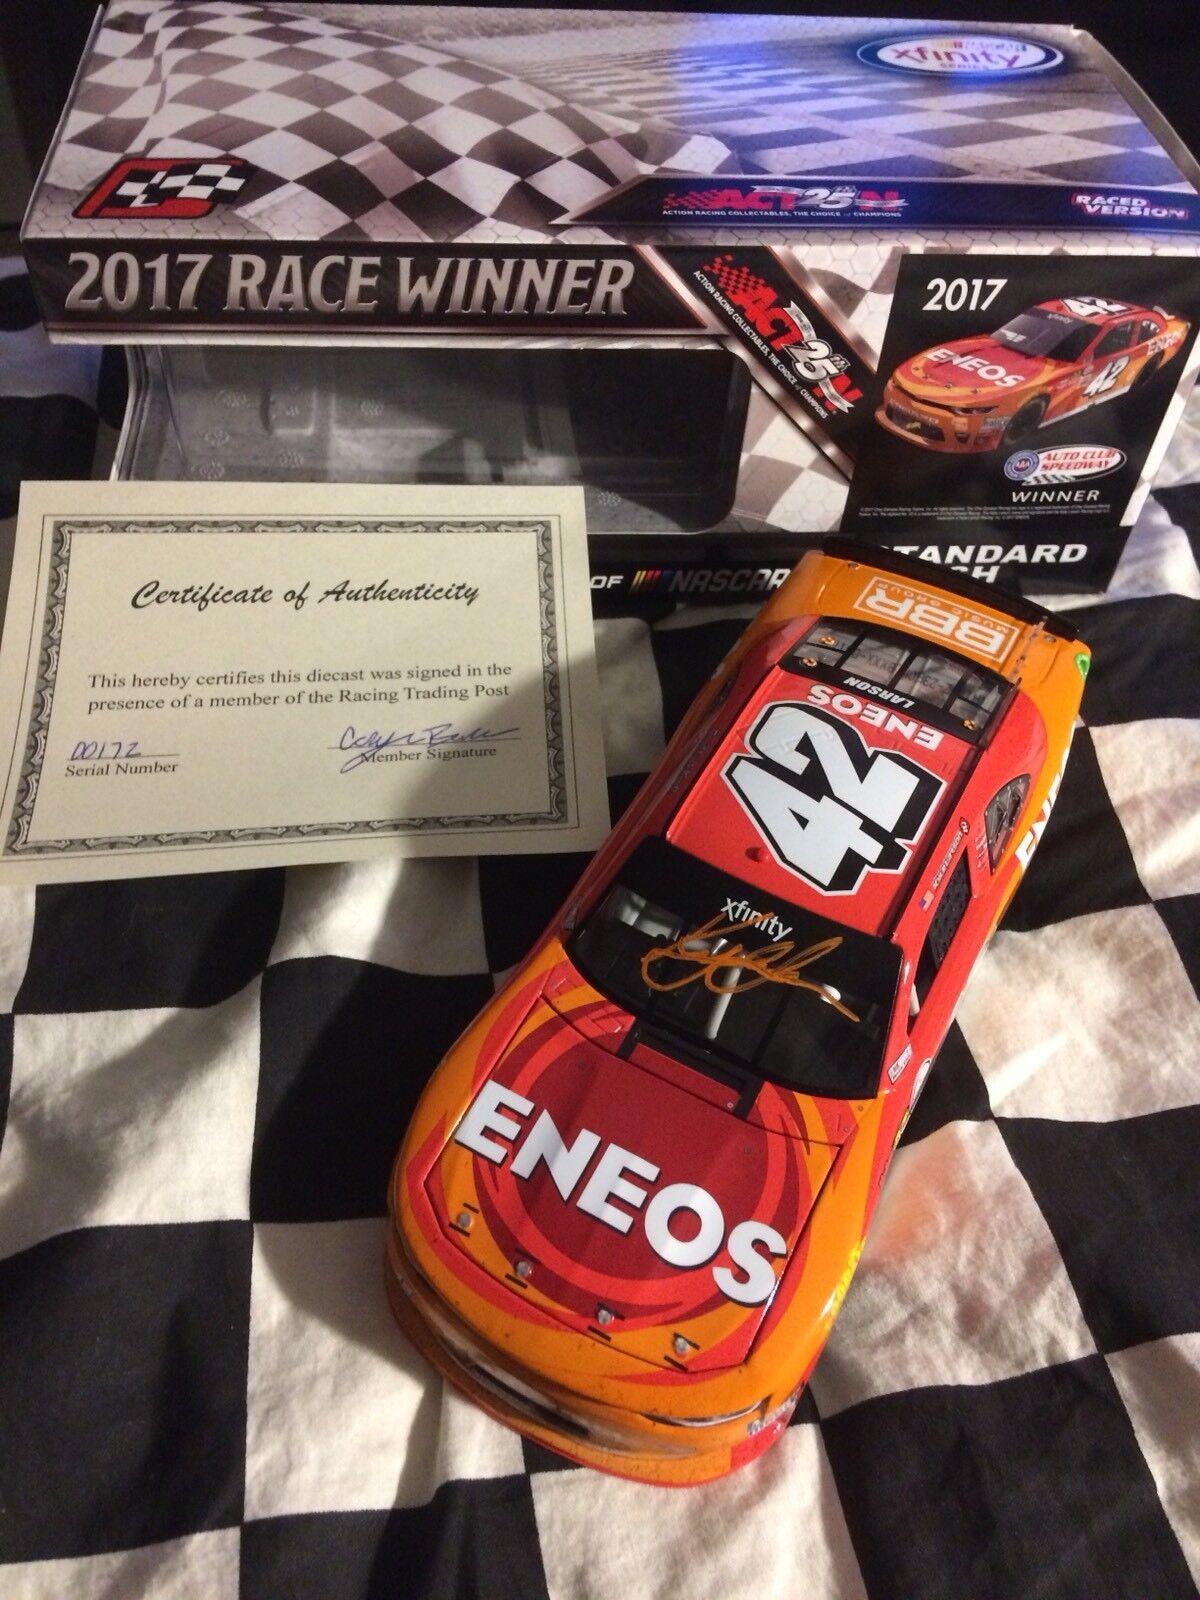 2017 Kyle Larson Eneos Fontana Win 1 24 - Autographed W coa